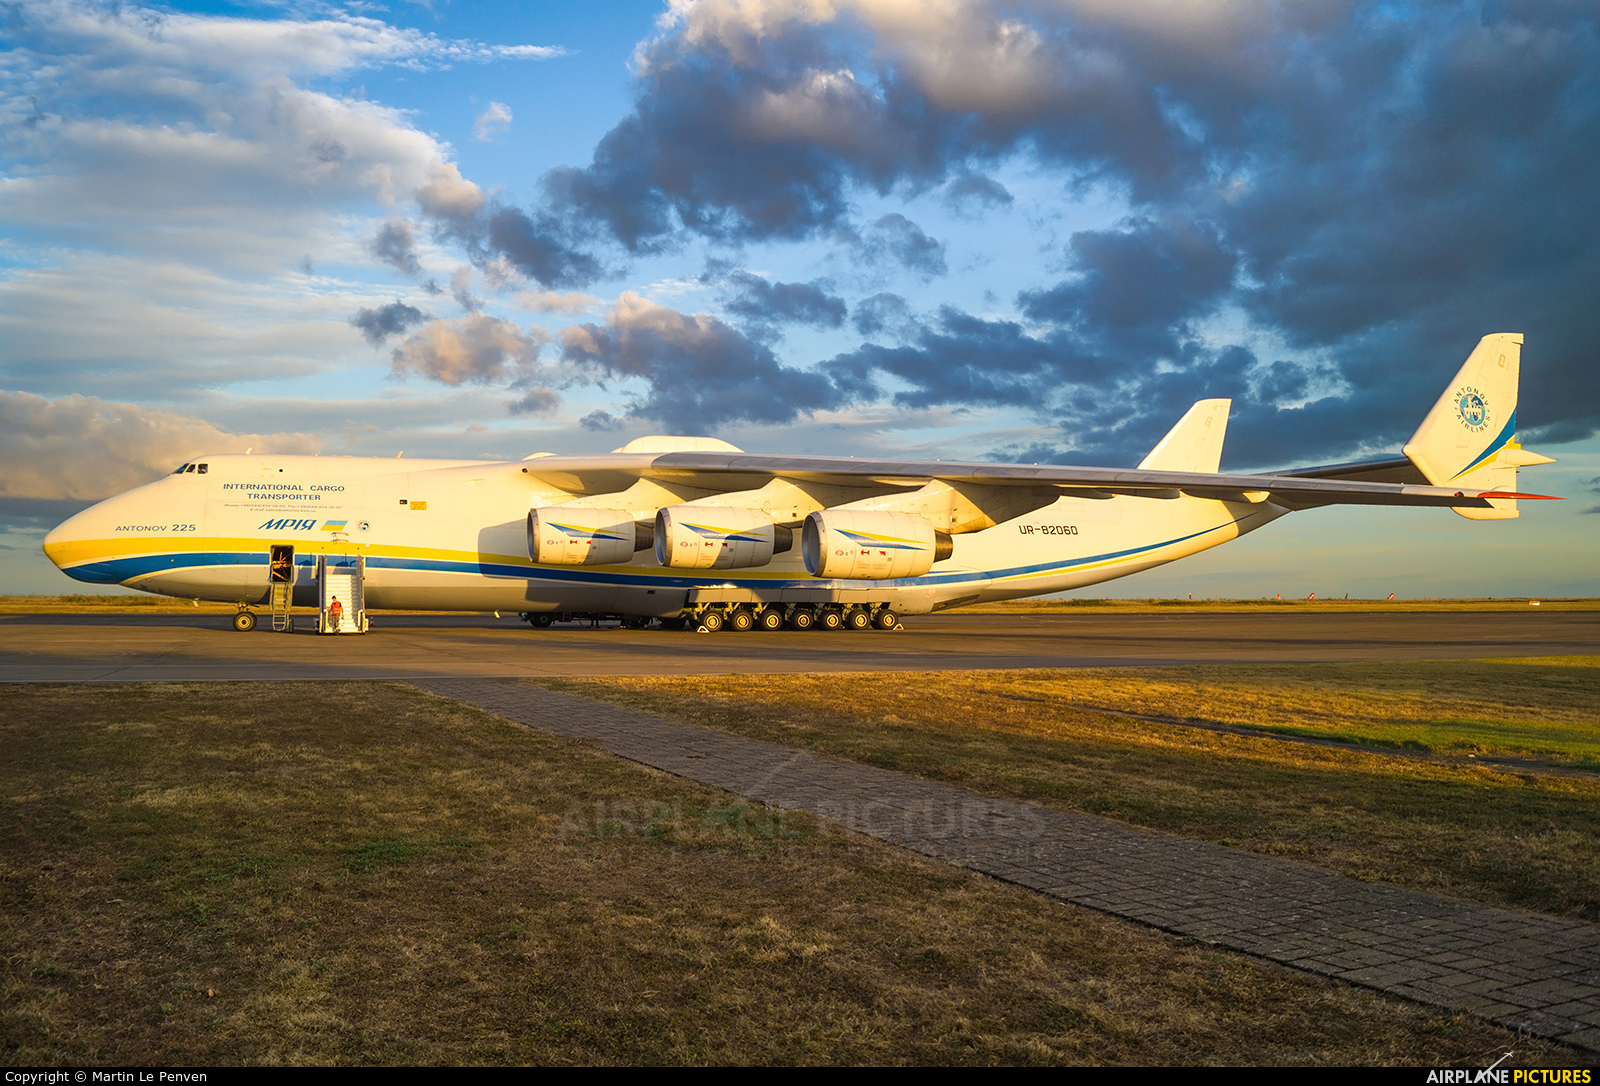 Antonov Airlines /  Design Bureau UR-82060 aircraft at Chateauroux - Deols (Marcel Dassault)